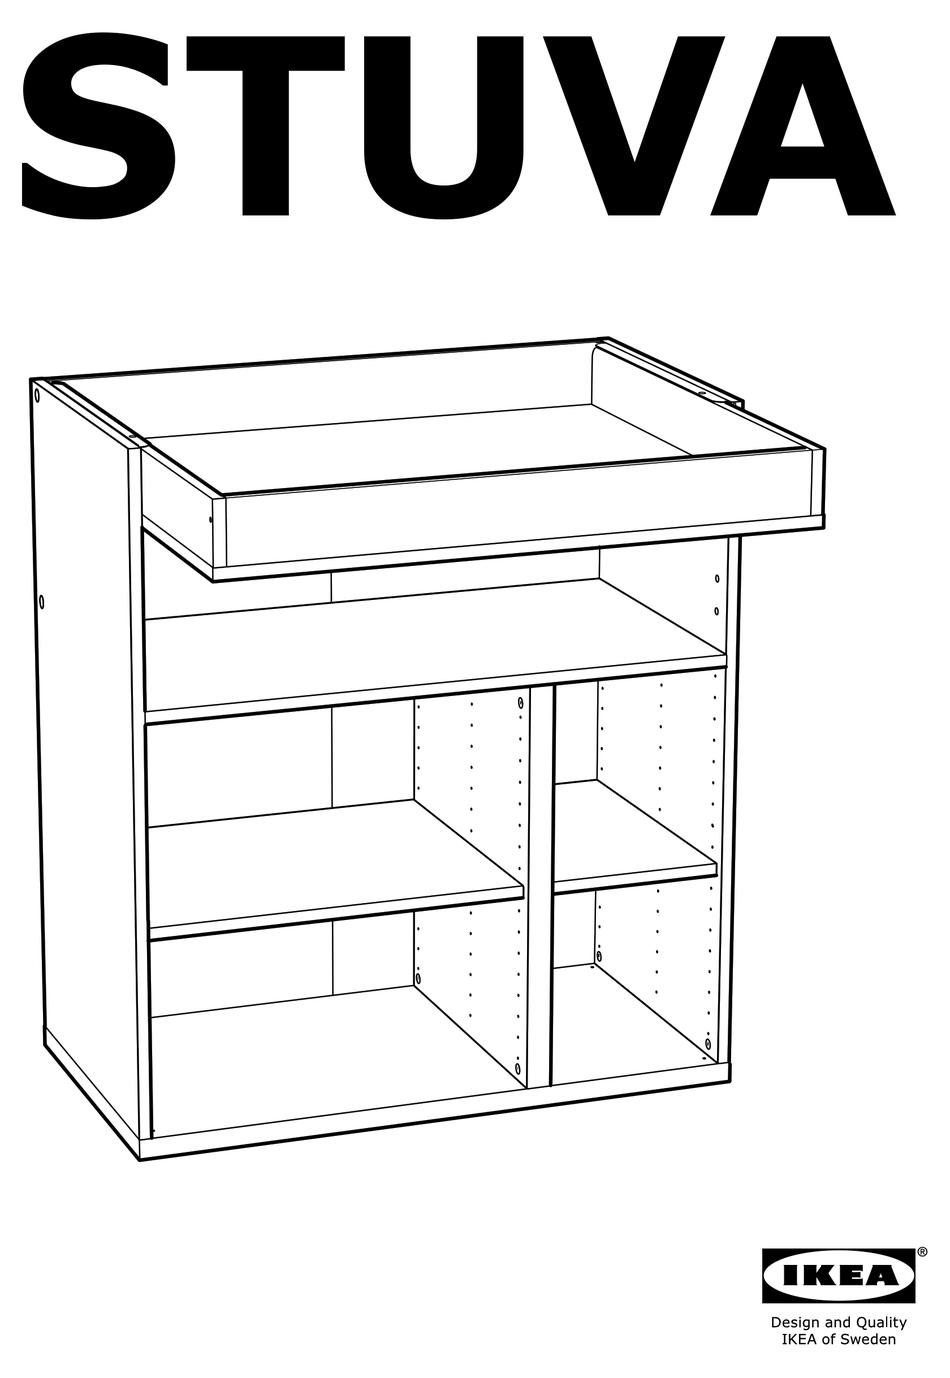 IKEA STUVA ASSEMBLY INSTRUCTIONS MANUAL Pdf Download